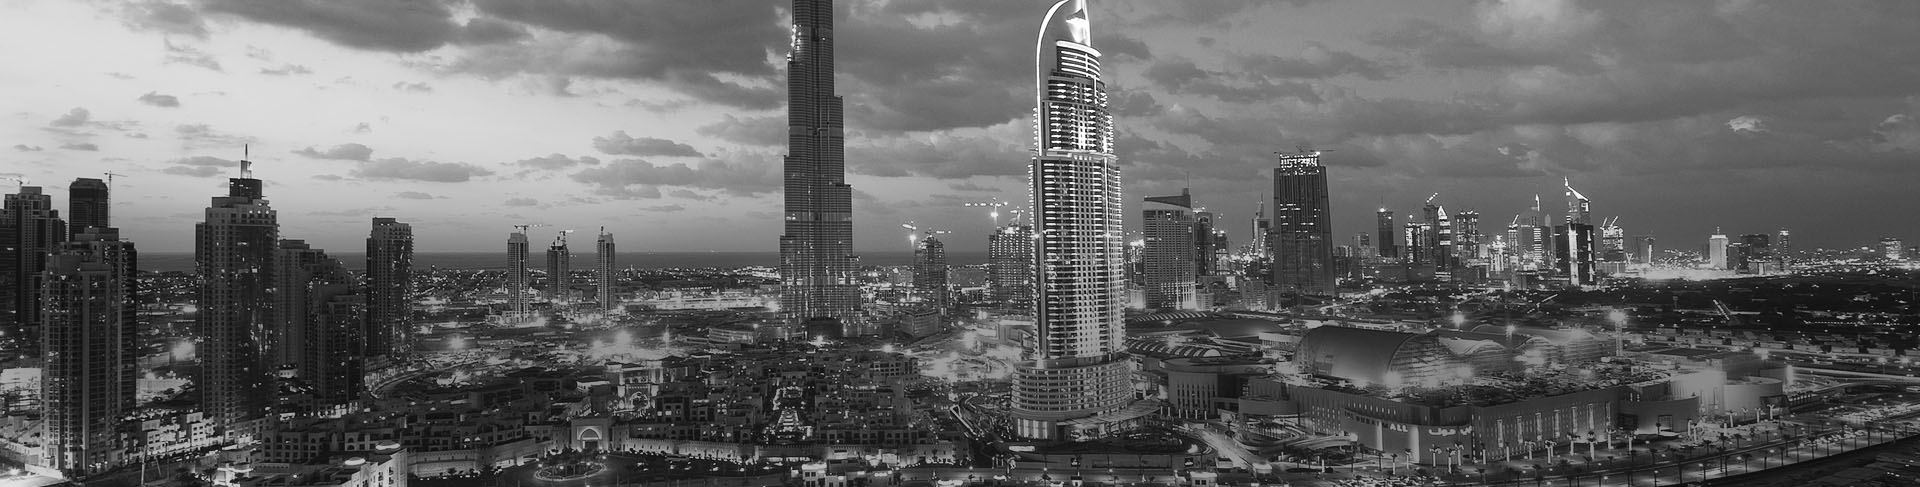 Contact for concrete building blocks